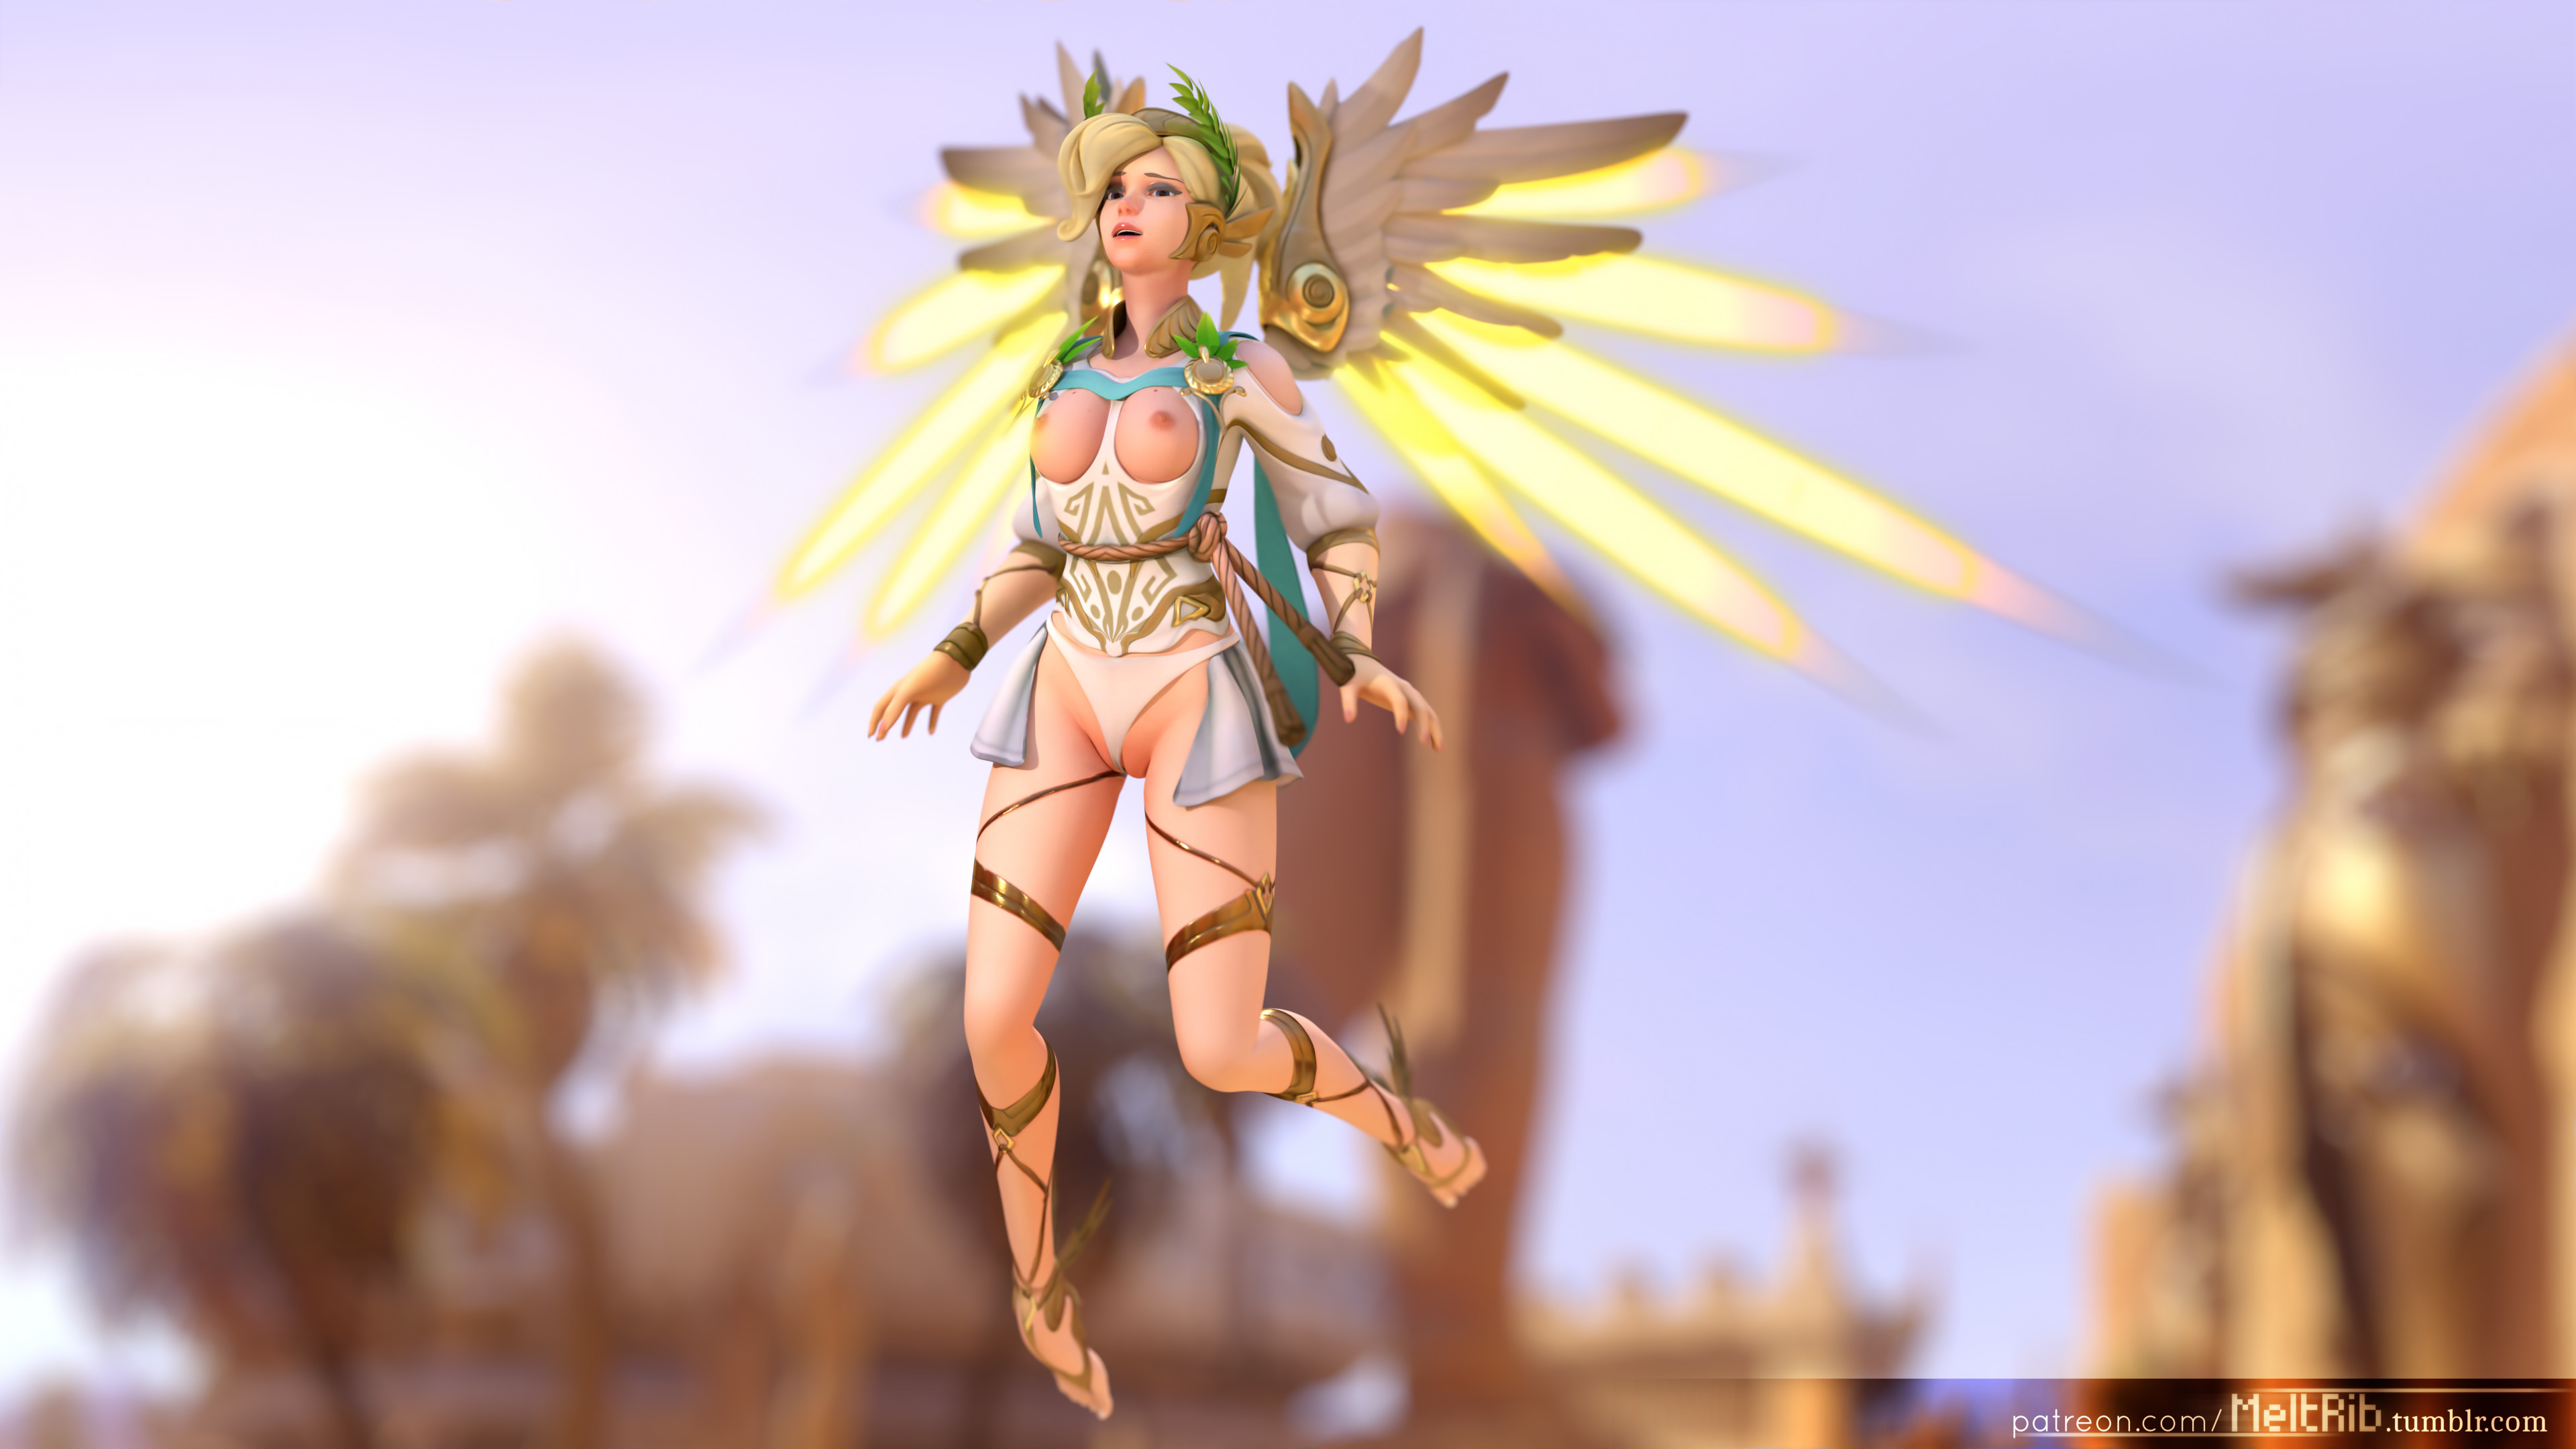 Overwatch Mercy Riding Pov